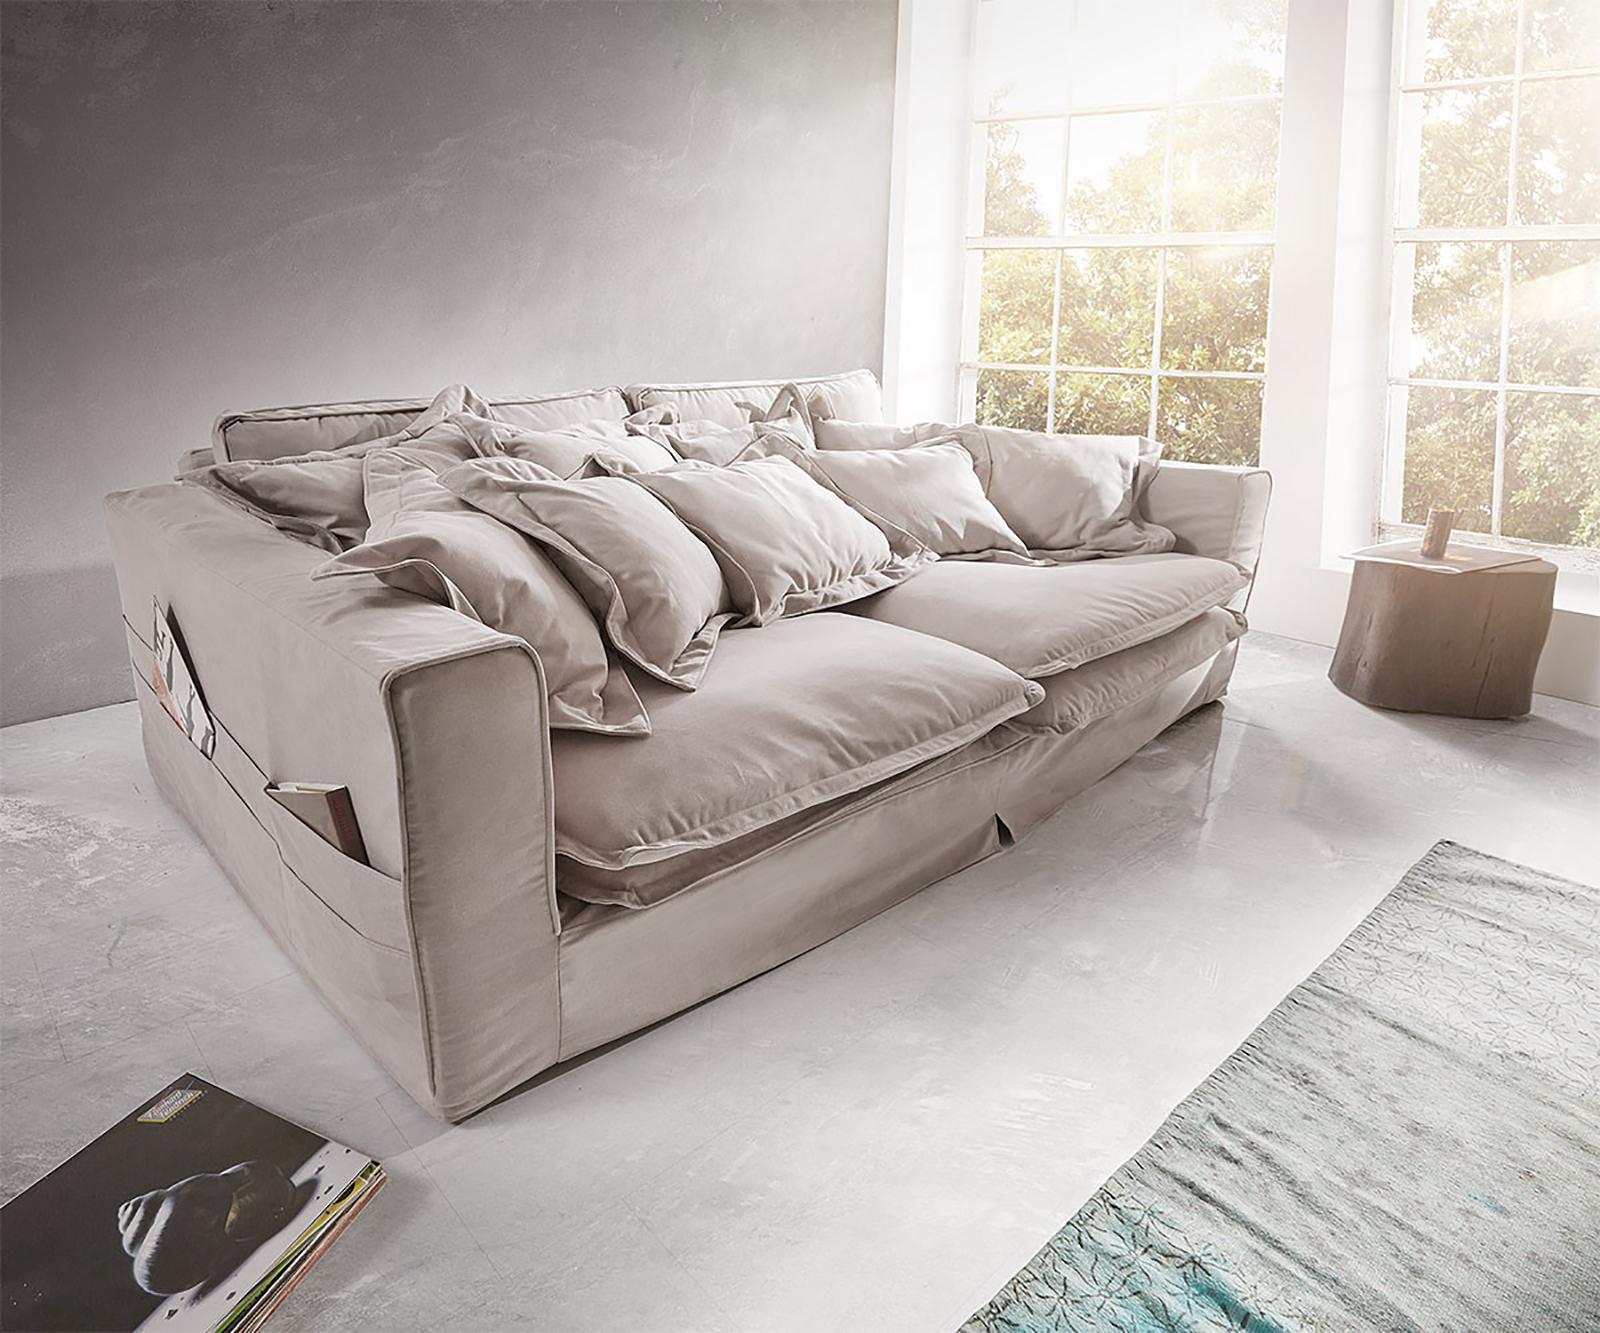 delife-hussensofa-noelia-240x145-cm-hellgrau-mit-kissen-big-sofas